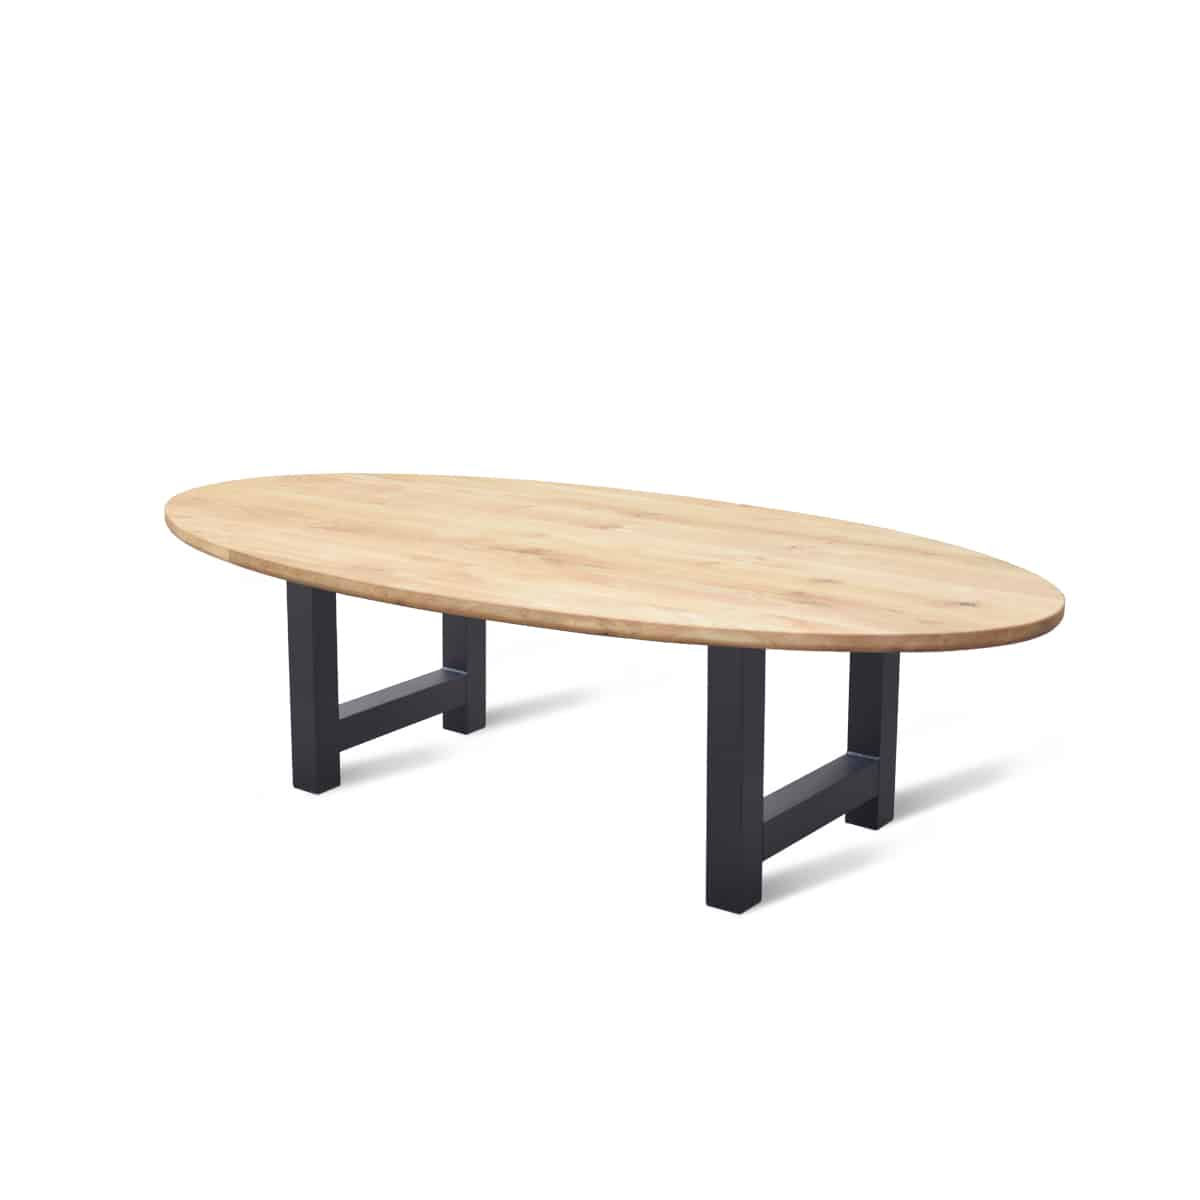 Massief eiken houten ovaal ovale eetkamer tafel eettafel keuken meubelmaker friesland